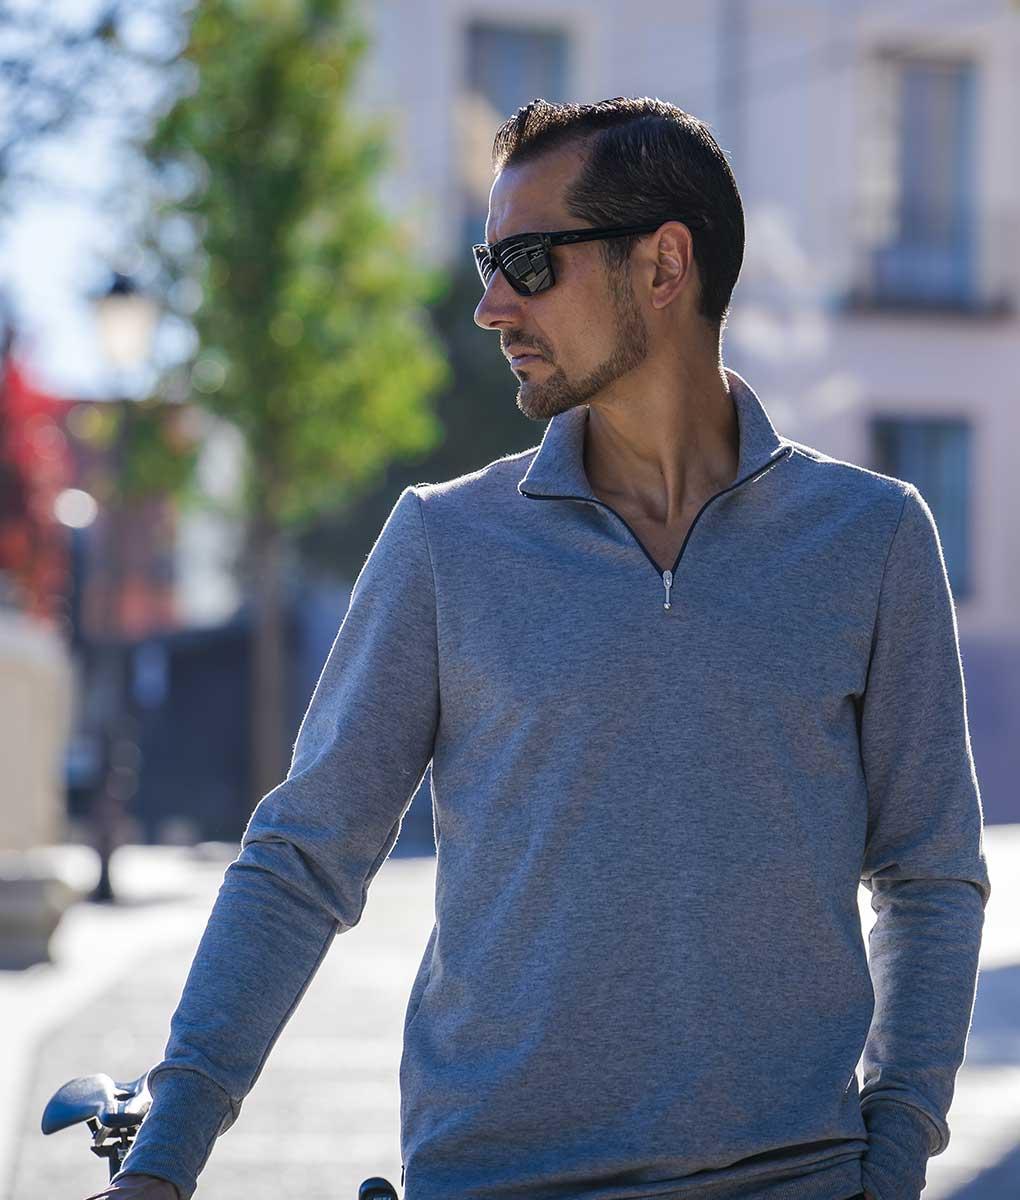 casual-cycling-Merino-Sweatshirt-grey-outside1